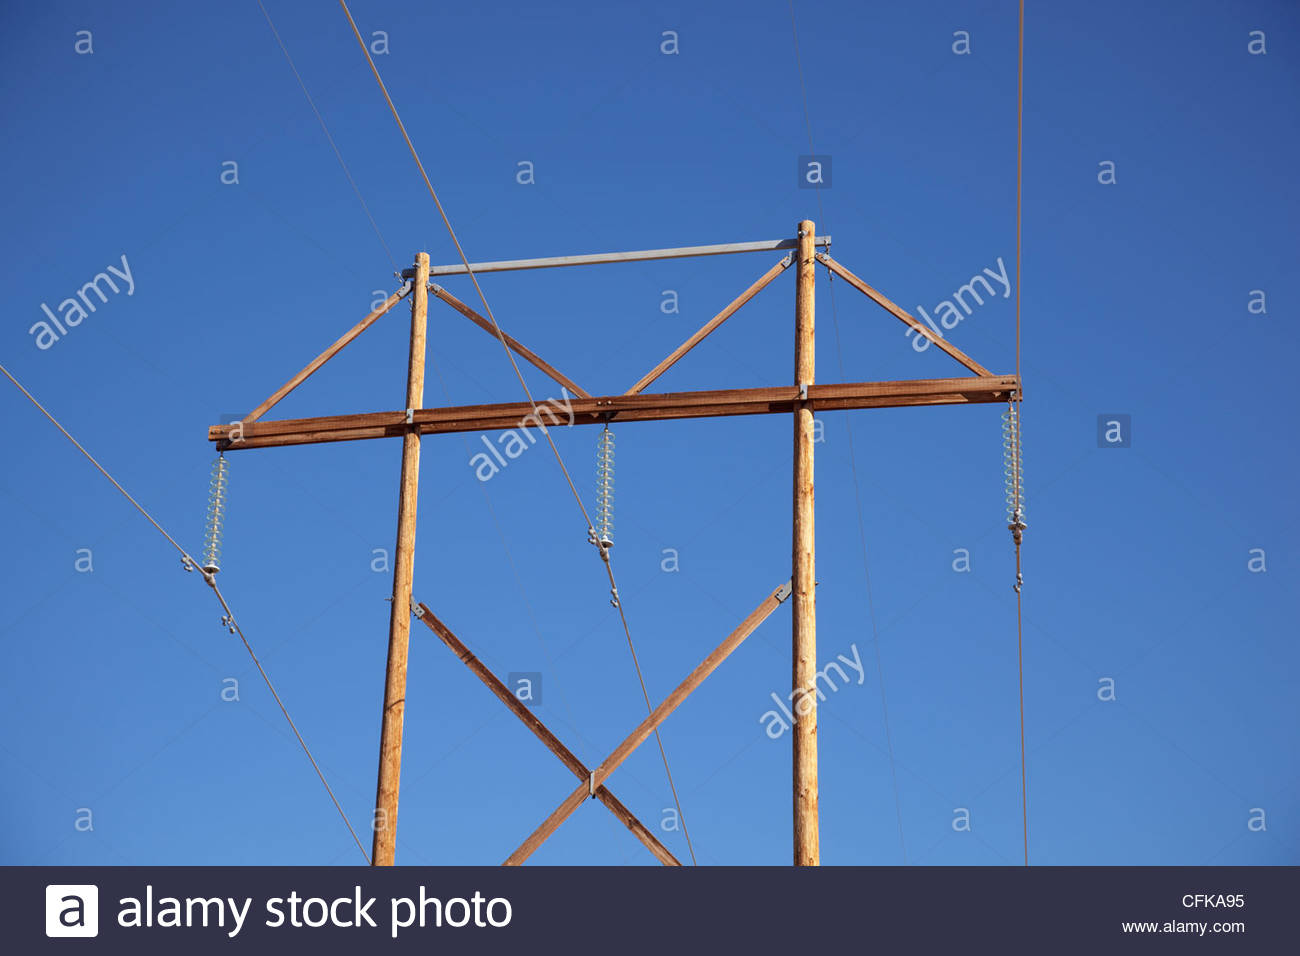 Electric Poles Power Lines : Wooden power poles lines arizona stock photo